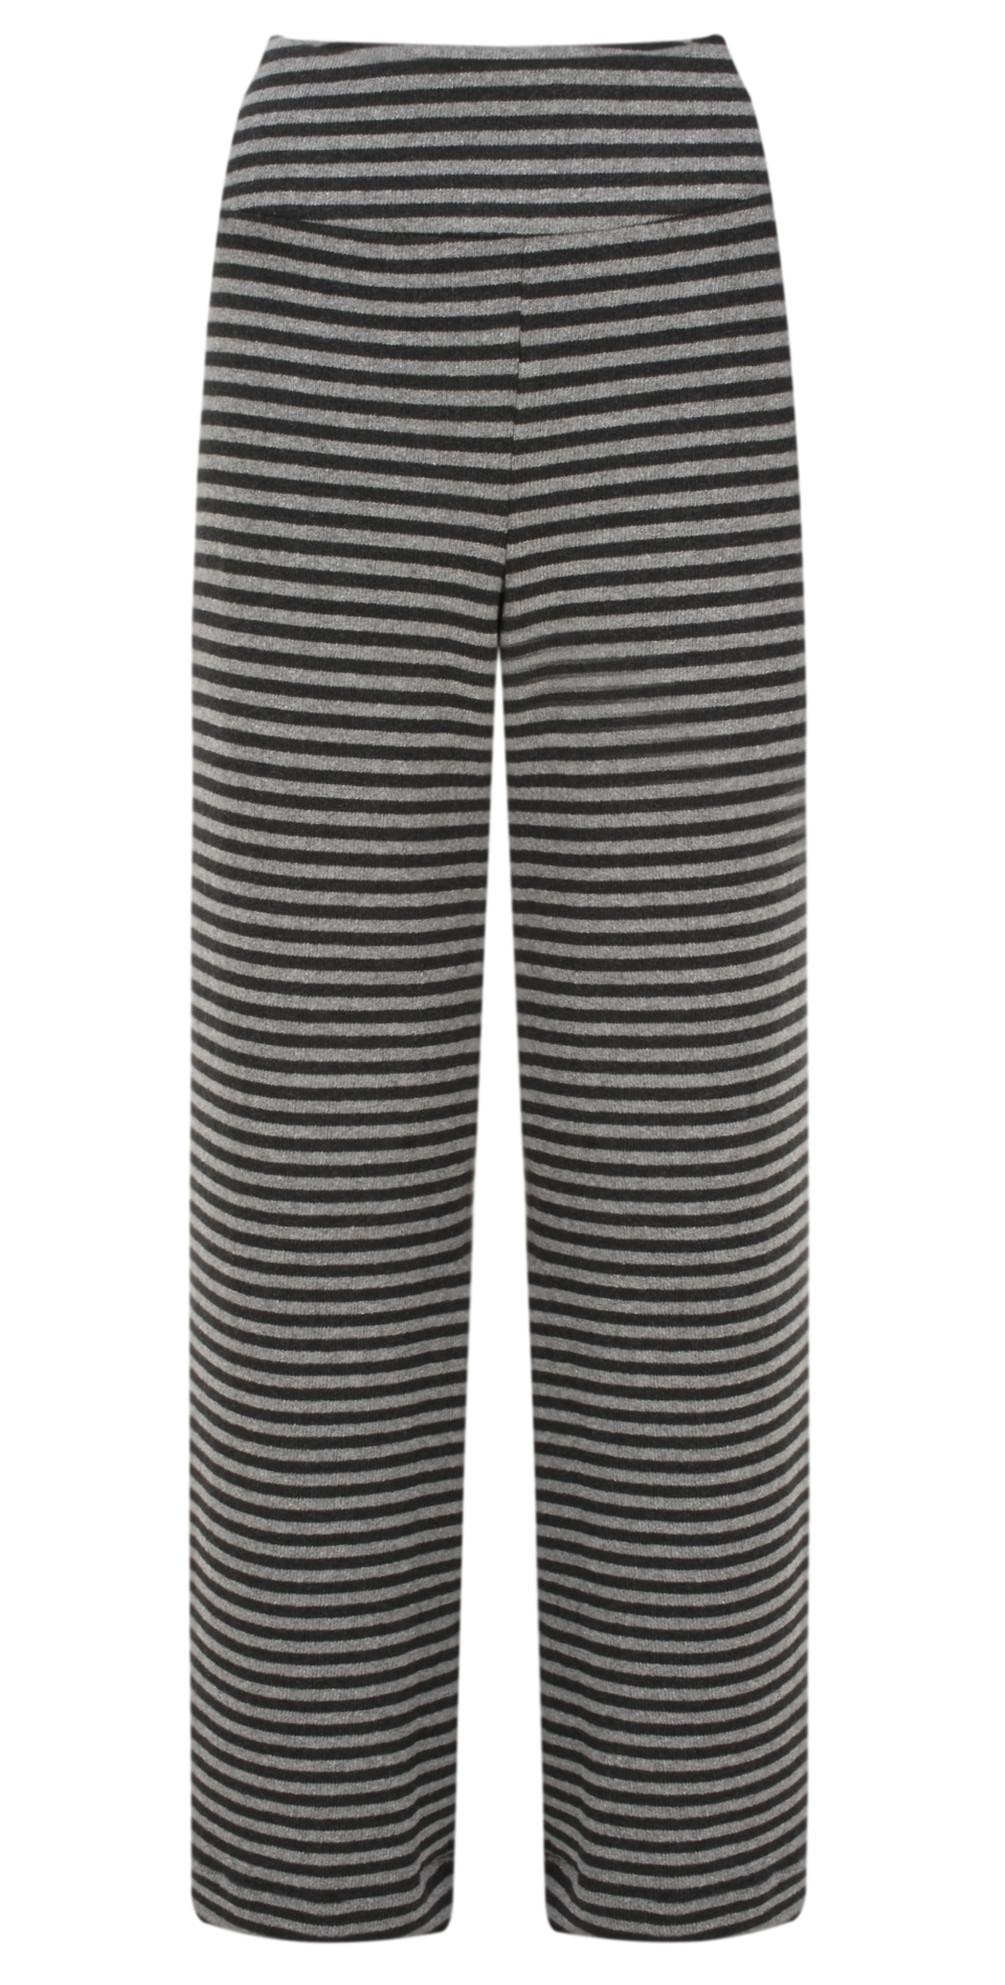 Striped Knit Brema Trouser main image